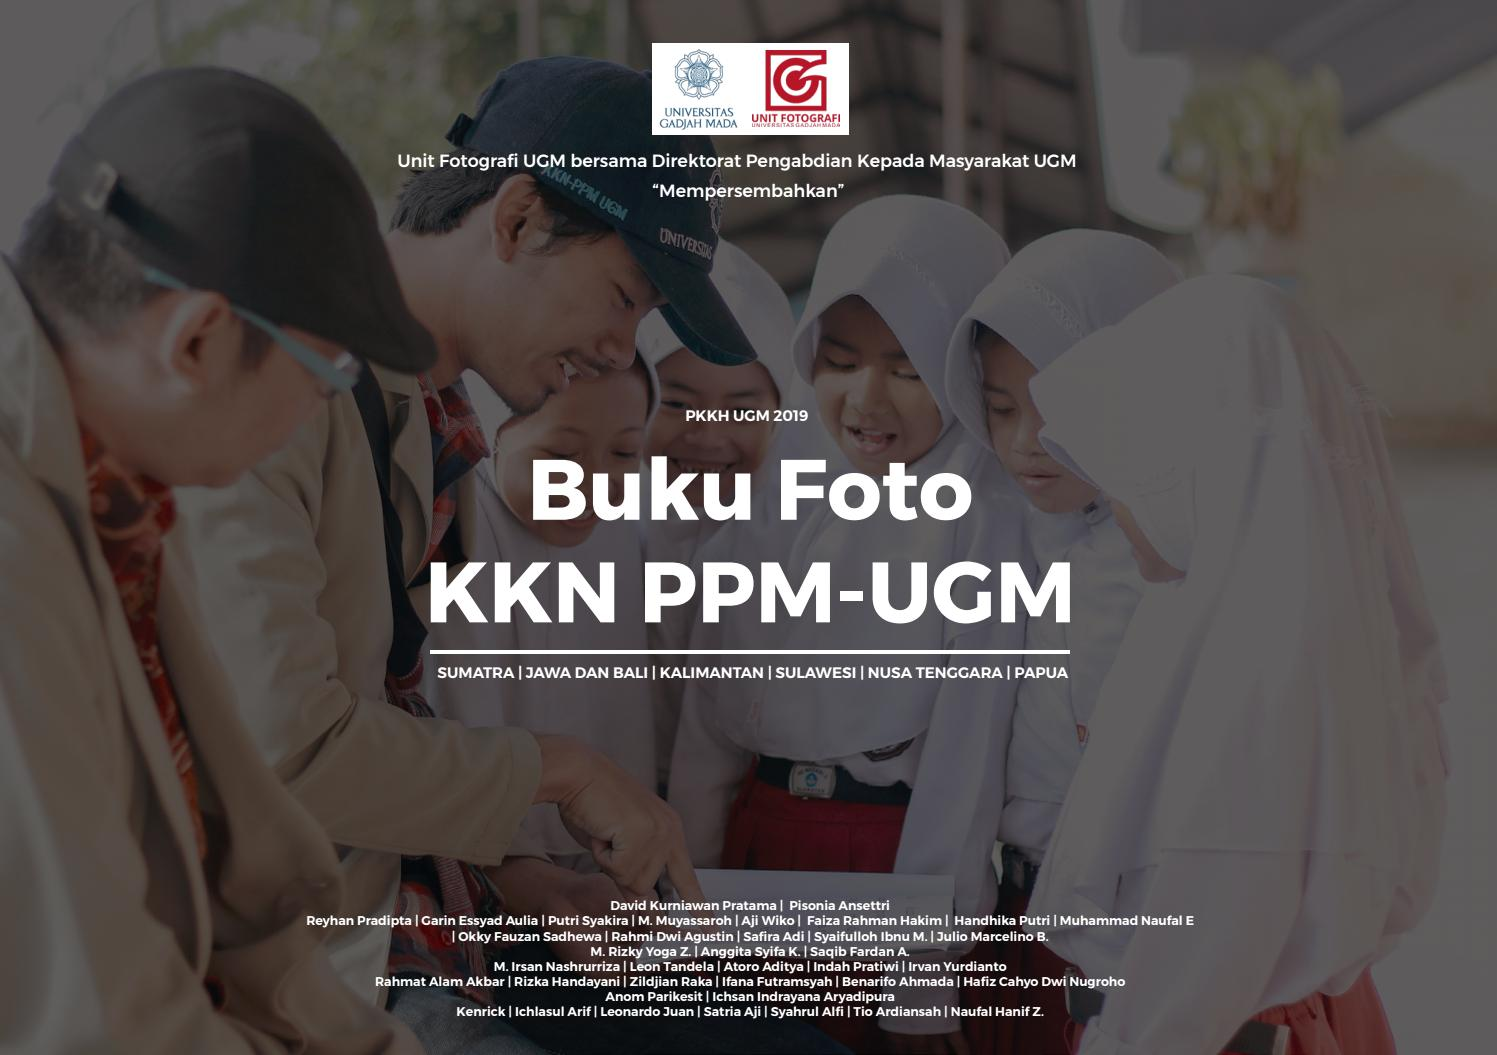 Buku Foto Pameran KKN PPM UGM 2019 By VICKY HERMAWAN Issuu